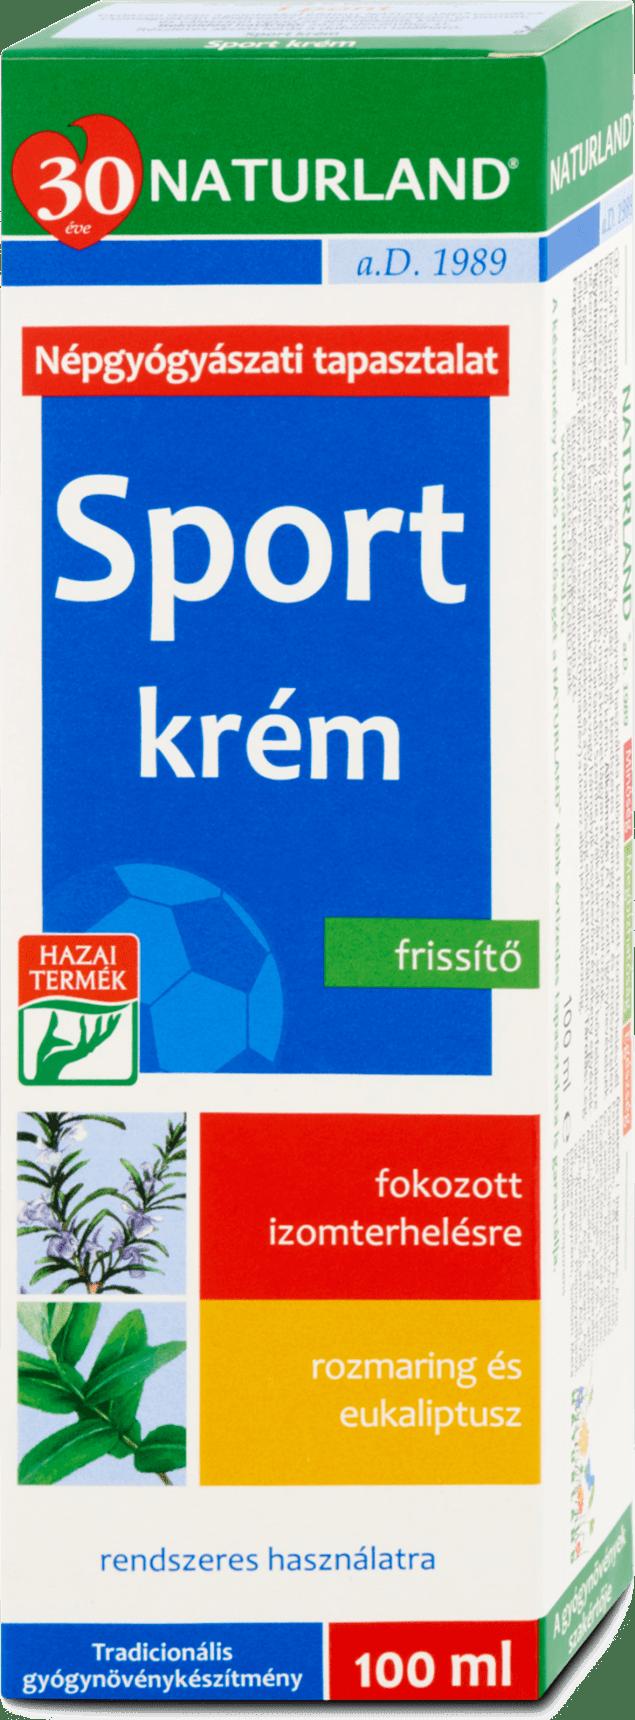 Naturland Naturland sportkrém 100 gr.